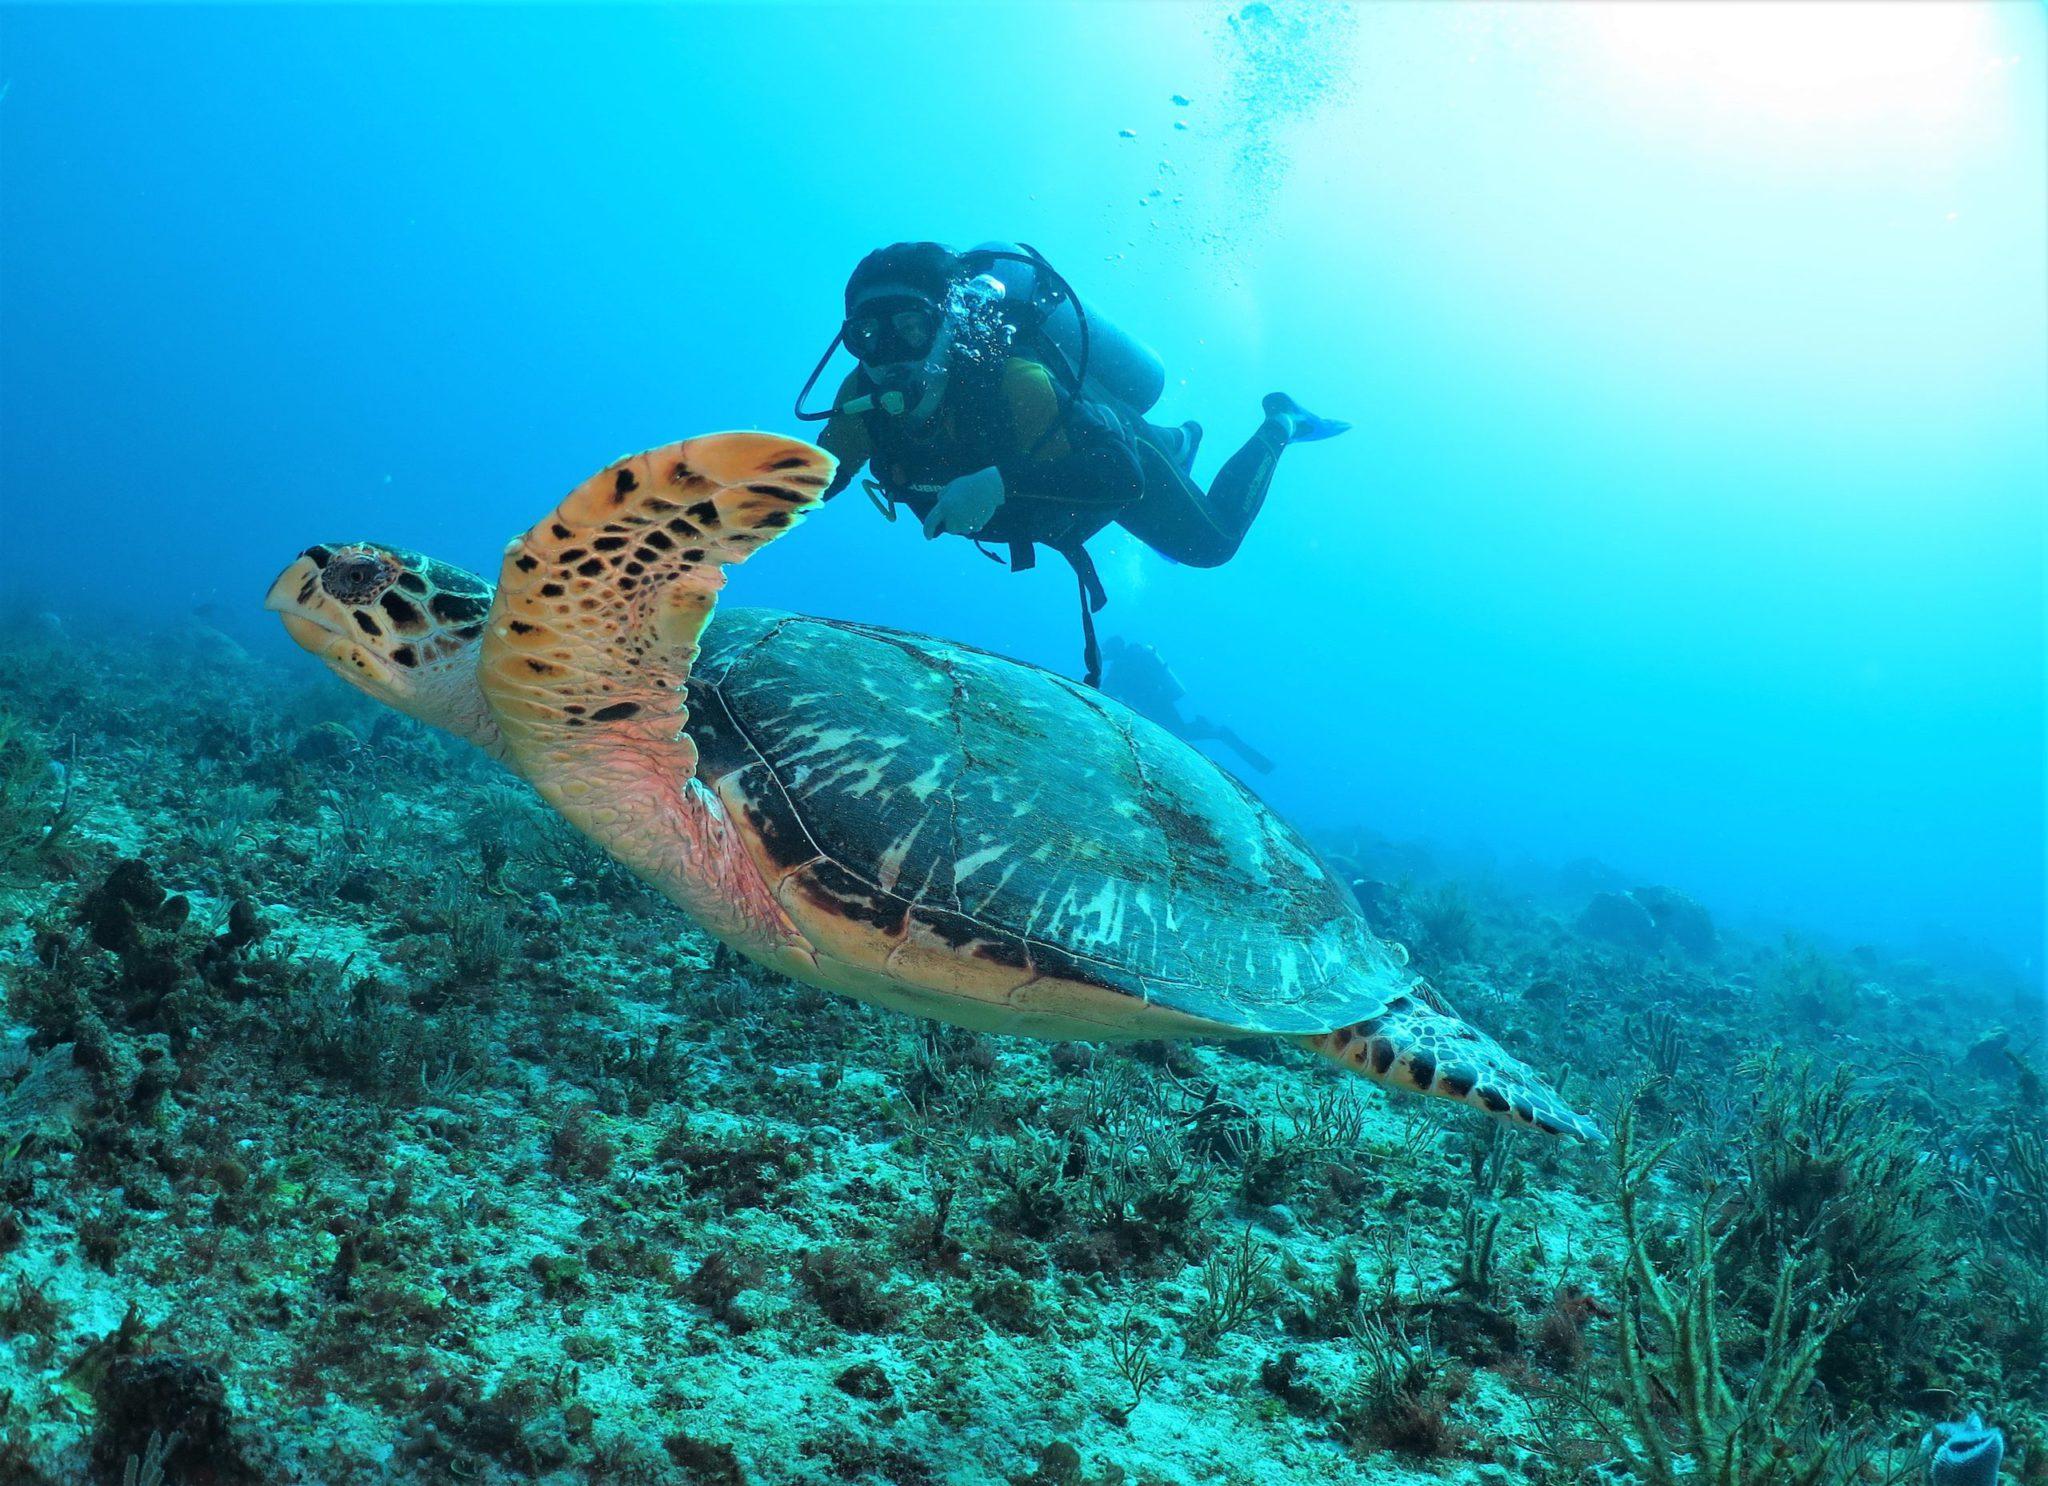 Playa del Carmen scuba diving experience: 2 dive day trip Mexico